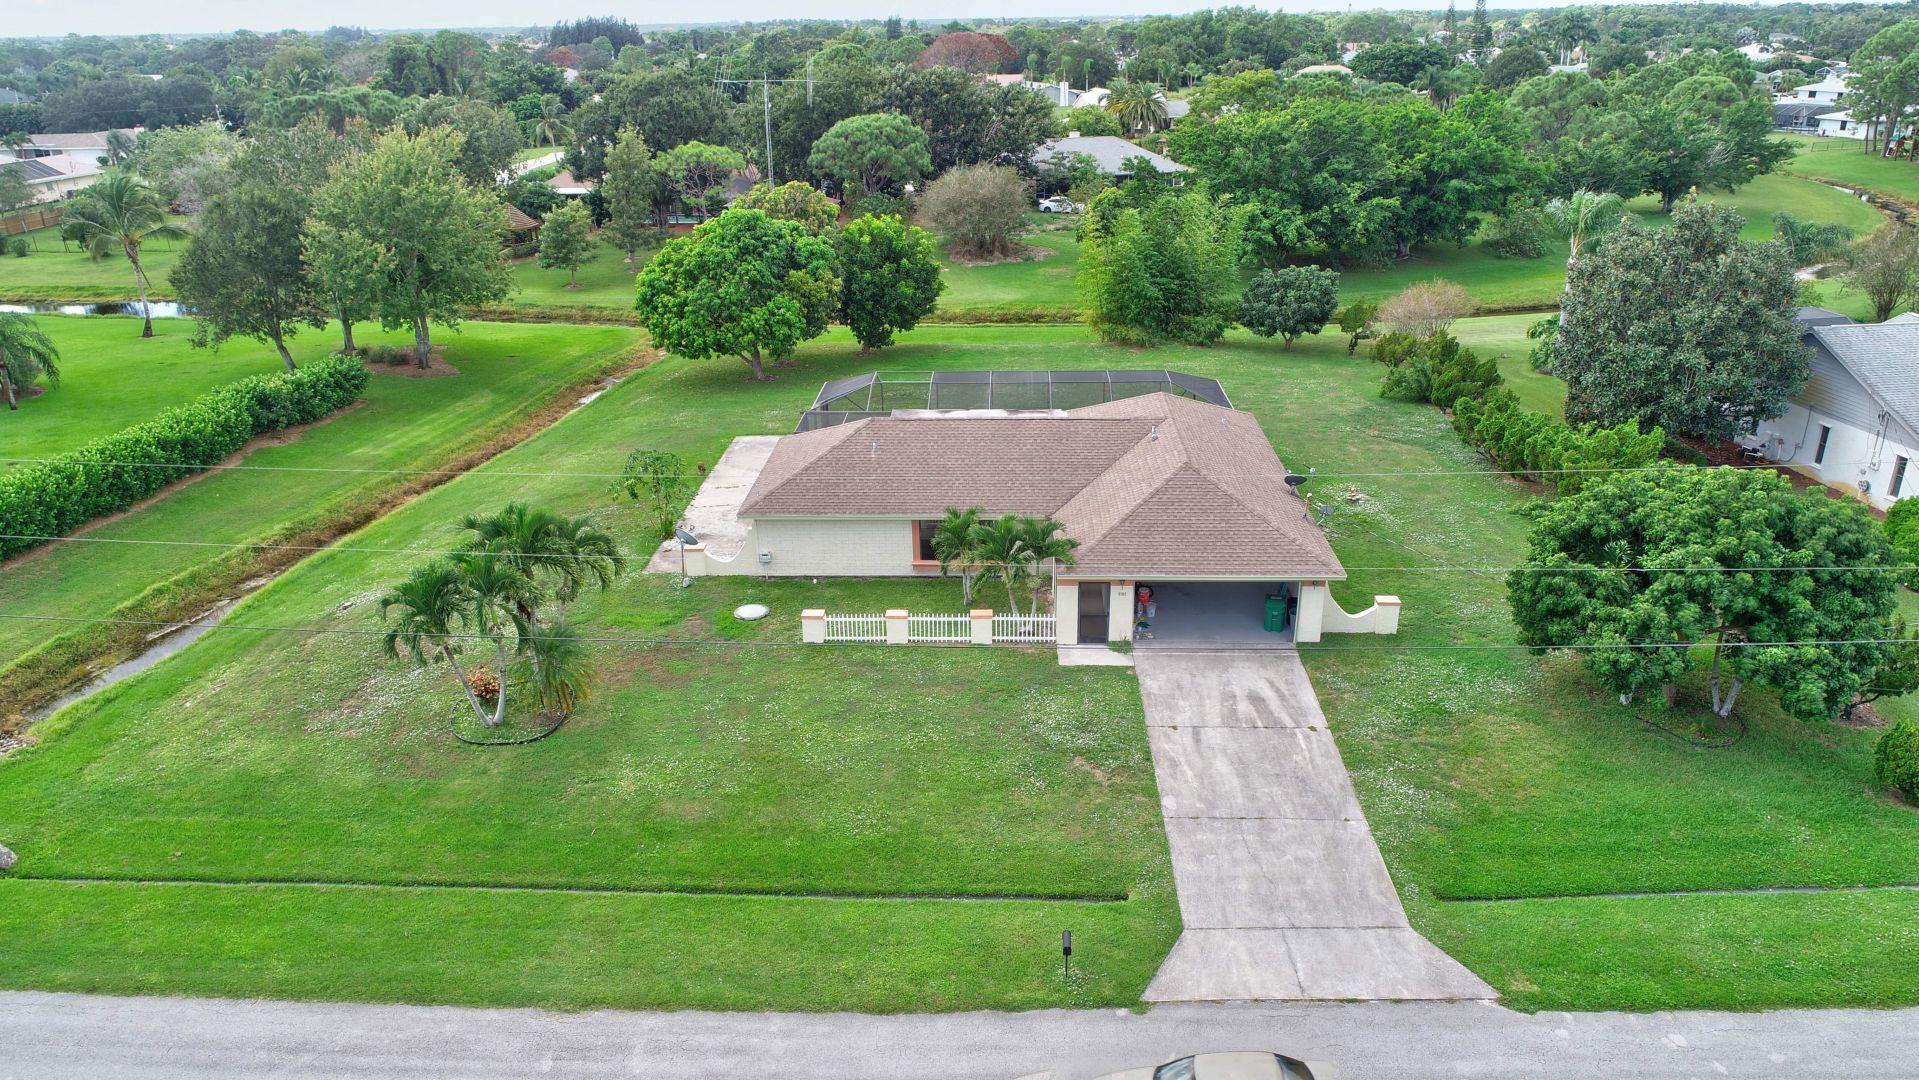 2102 Se Pyramid Road, Port Saint Lucie, FL 34952